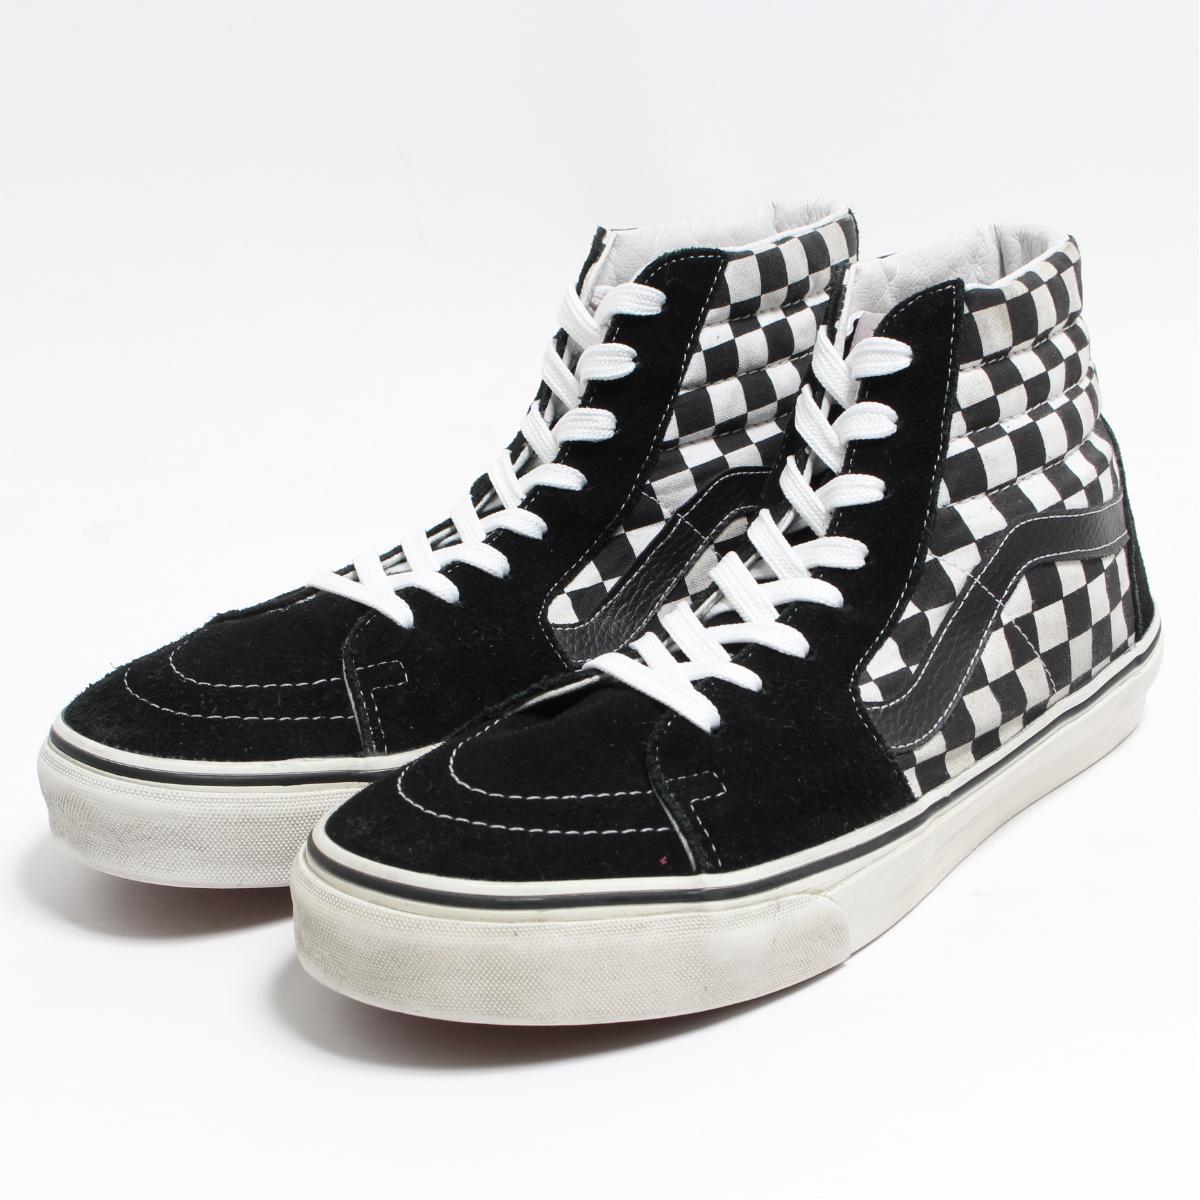 fbace65d8c9 Vans VANS SK8-HI checker flag high-top sneakers US10 men 28.0cm  boo7916